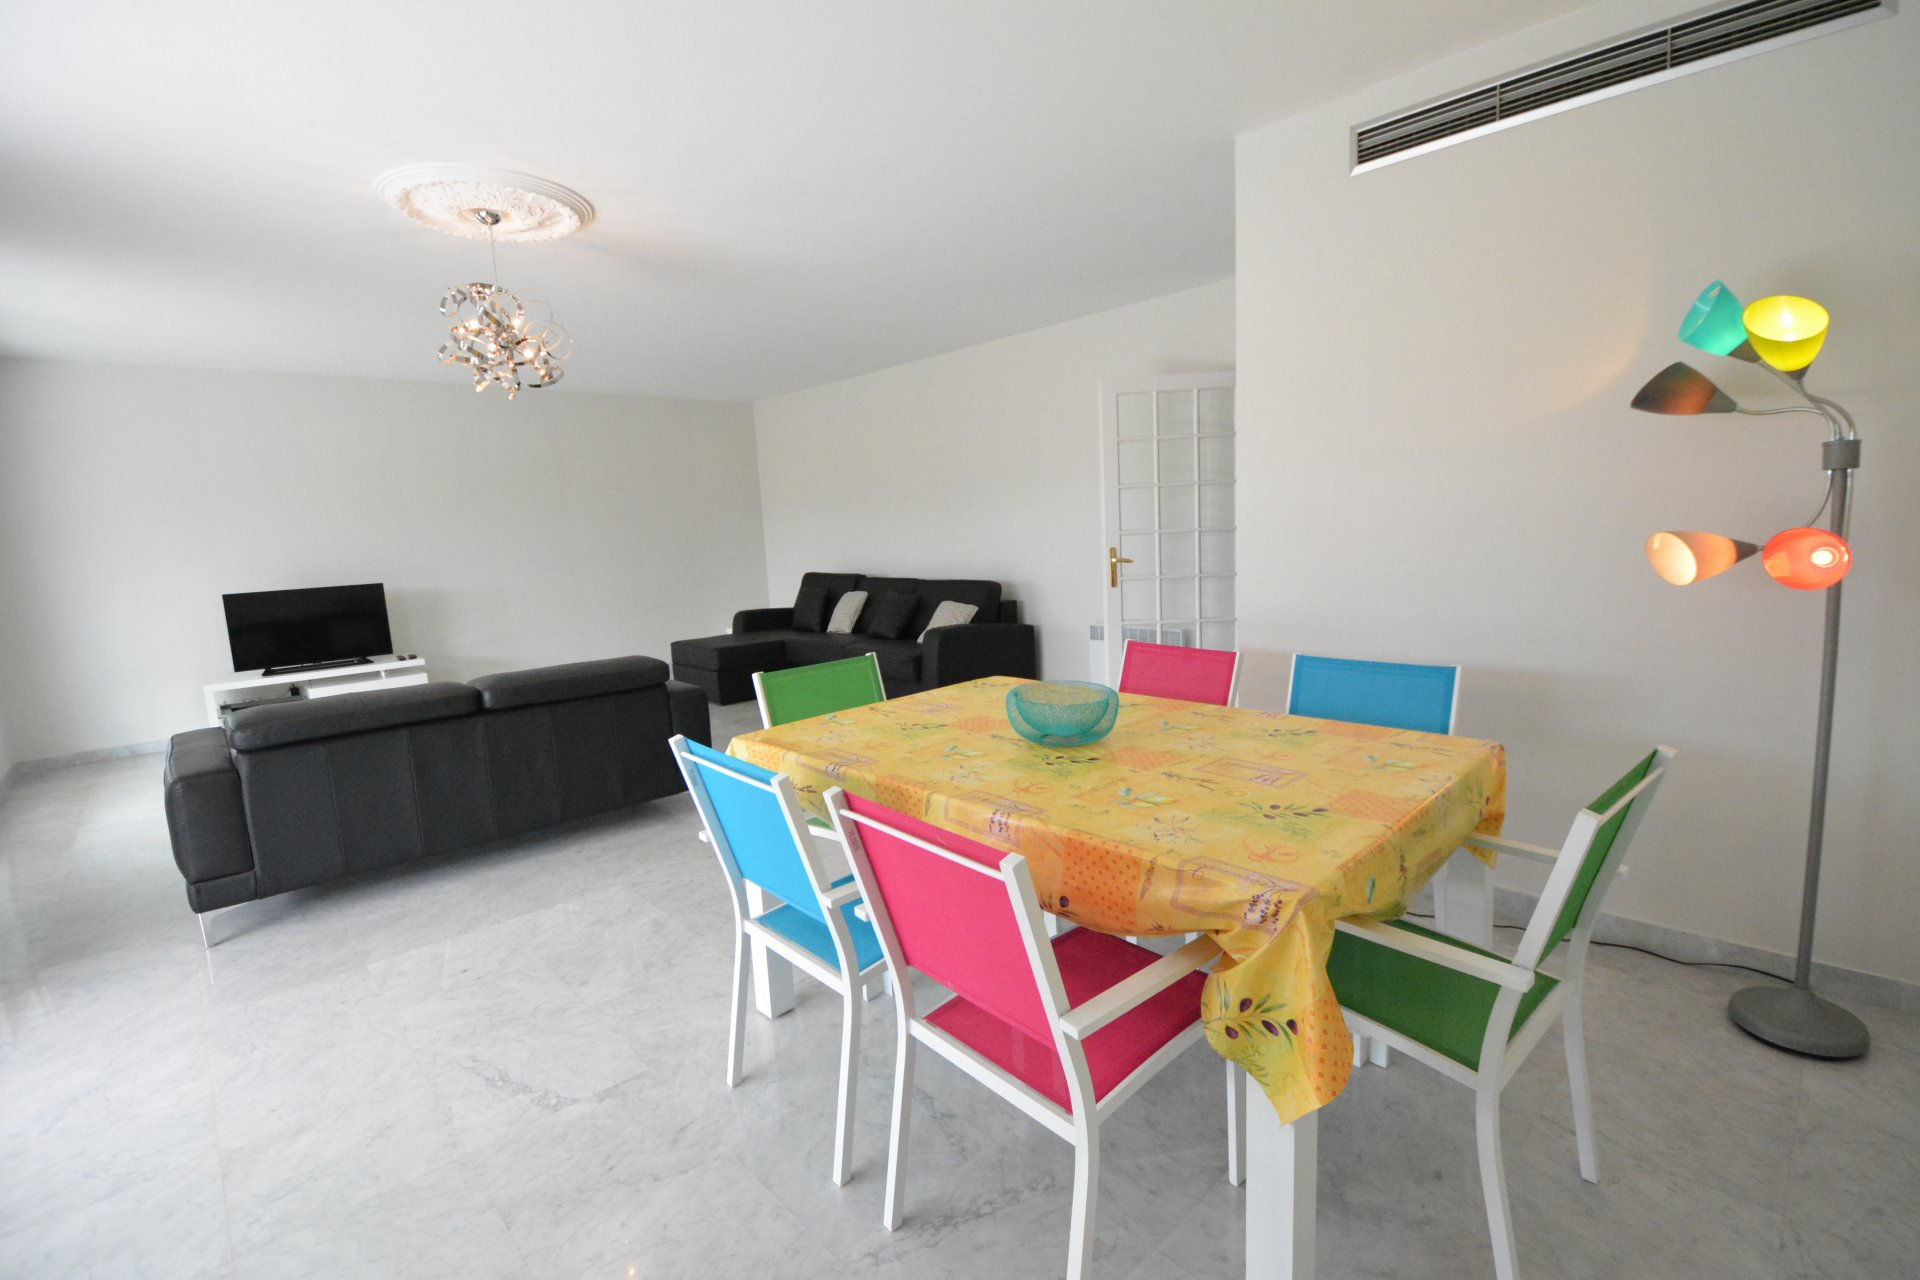 Четырехкомнатная квартира в аренду - Жуан ле Пен центр